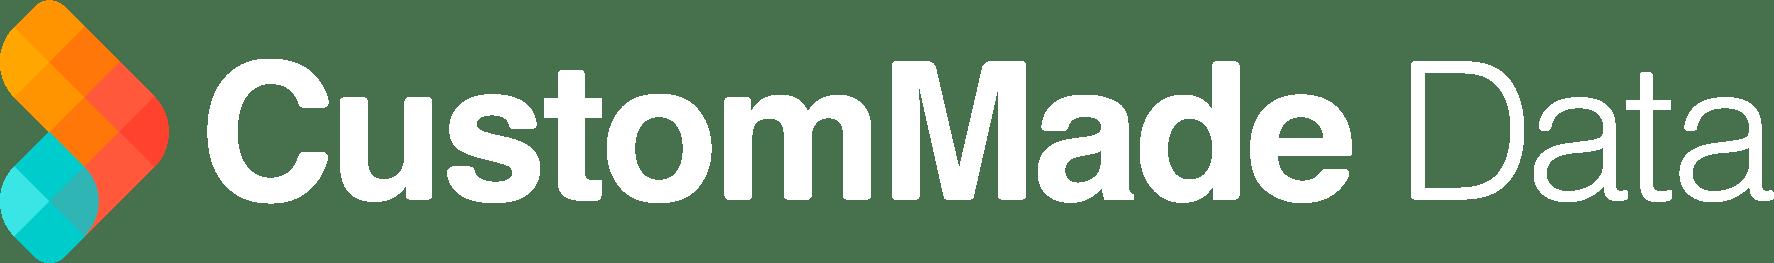 Custom Made Data